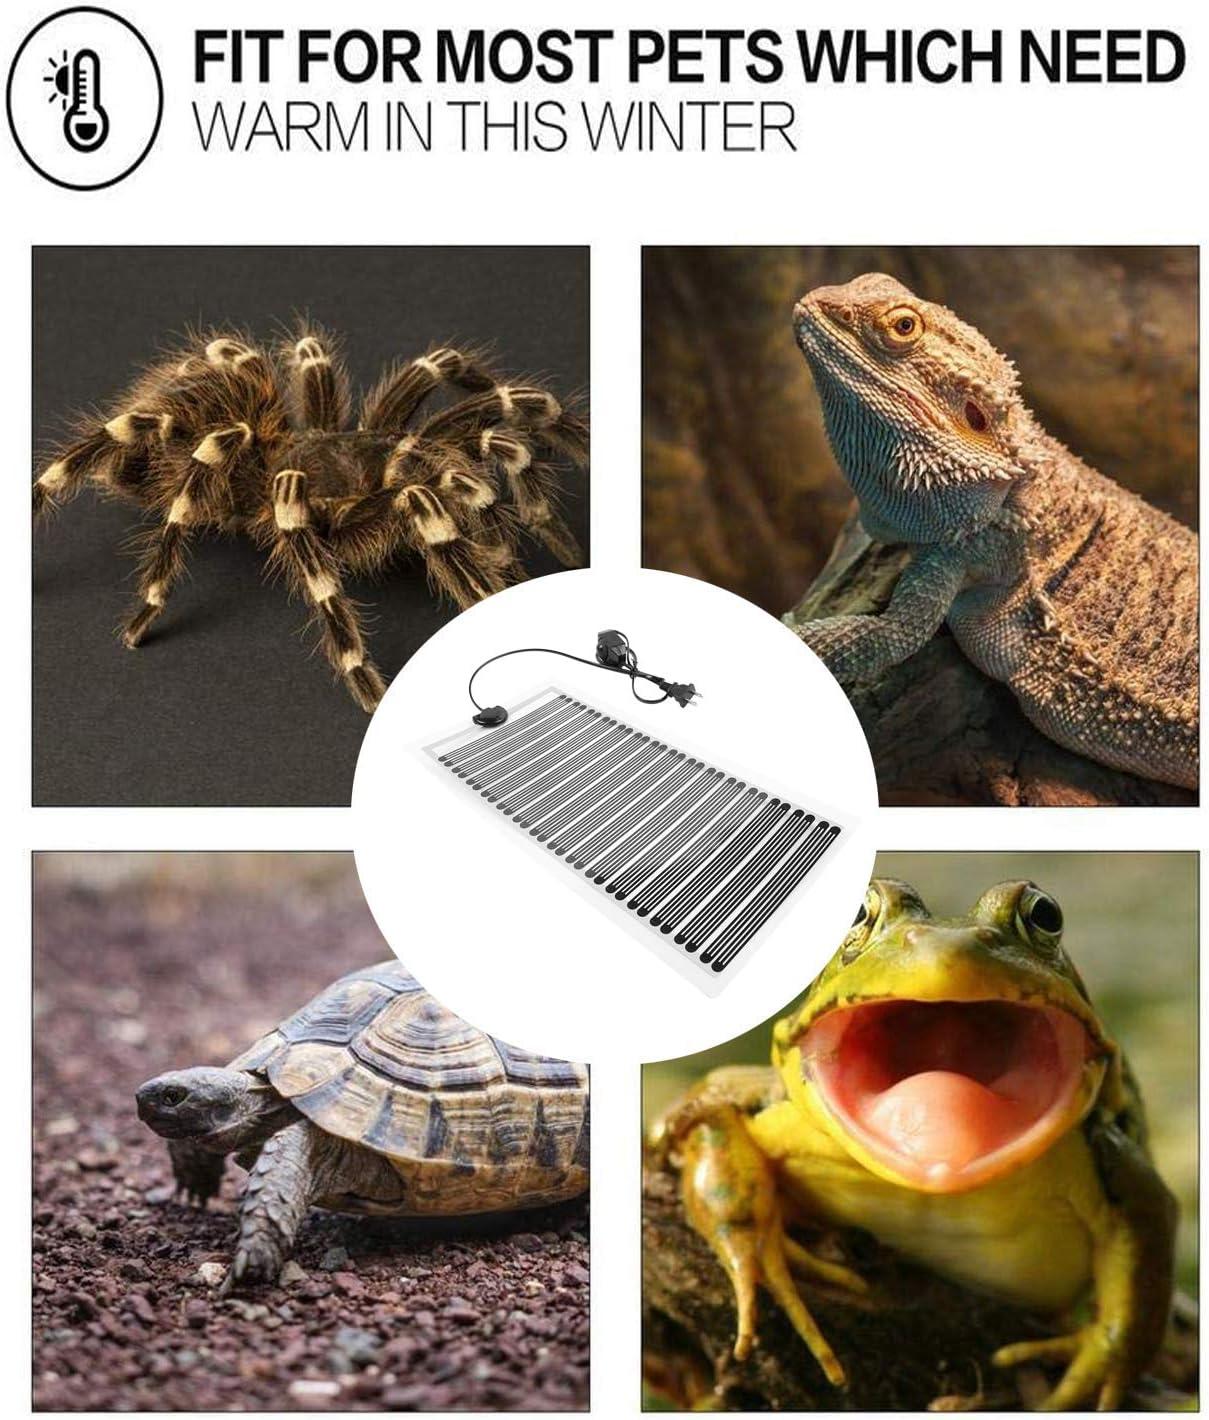 110V 25W Reptile Tank Warmer Terrarium Heater Mat with Temperature Controller Leopard Gecko Heating Pad Fashionclubs Reptile Heat Pad Under Tank Heating Mat